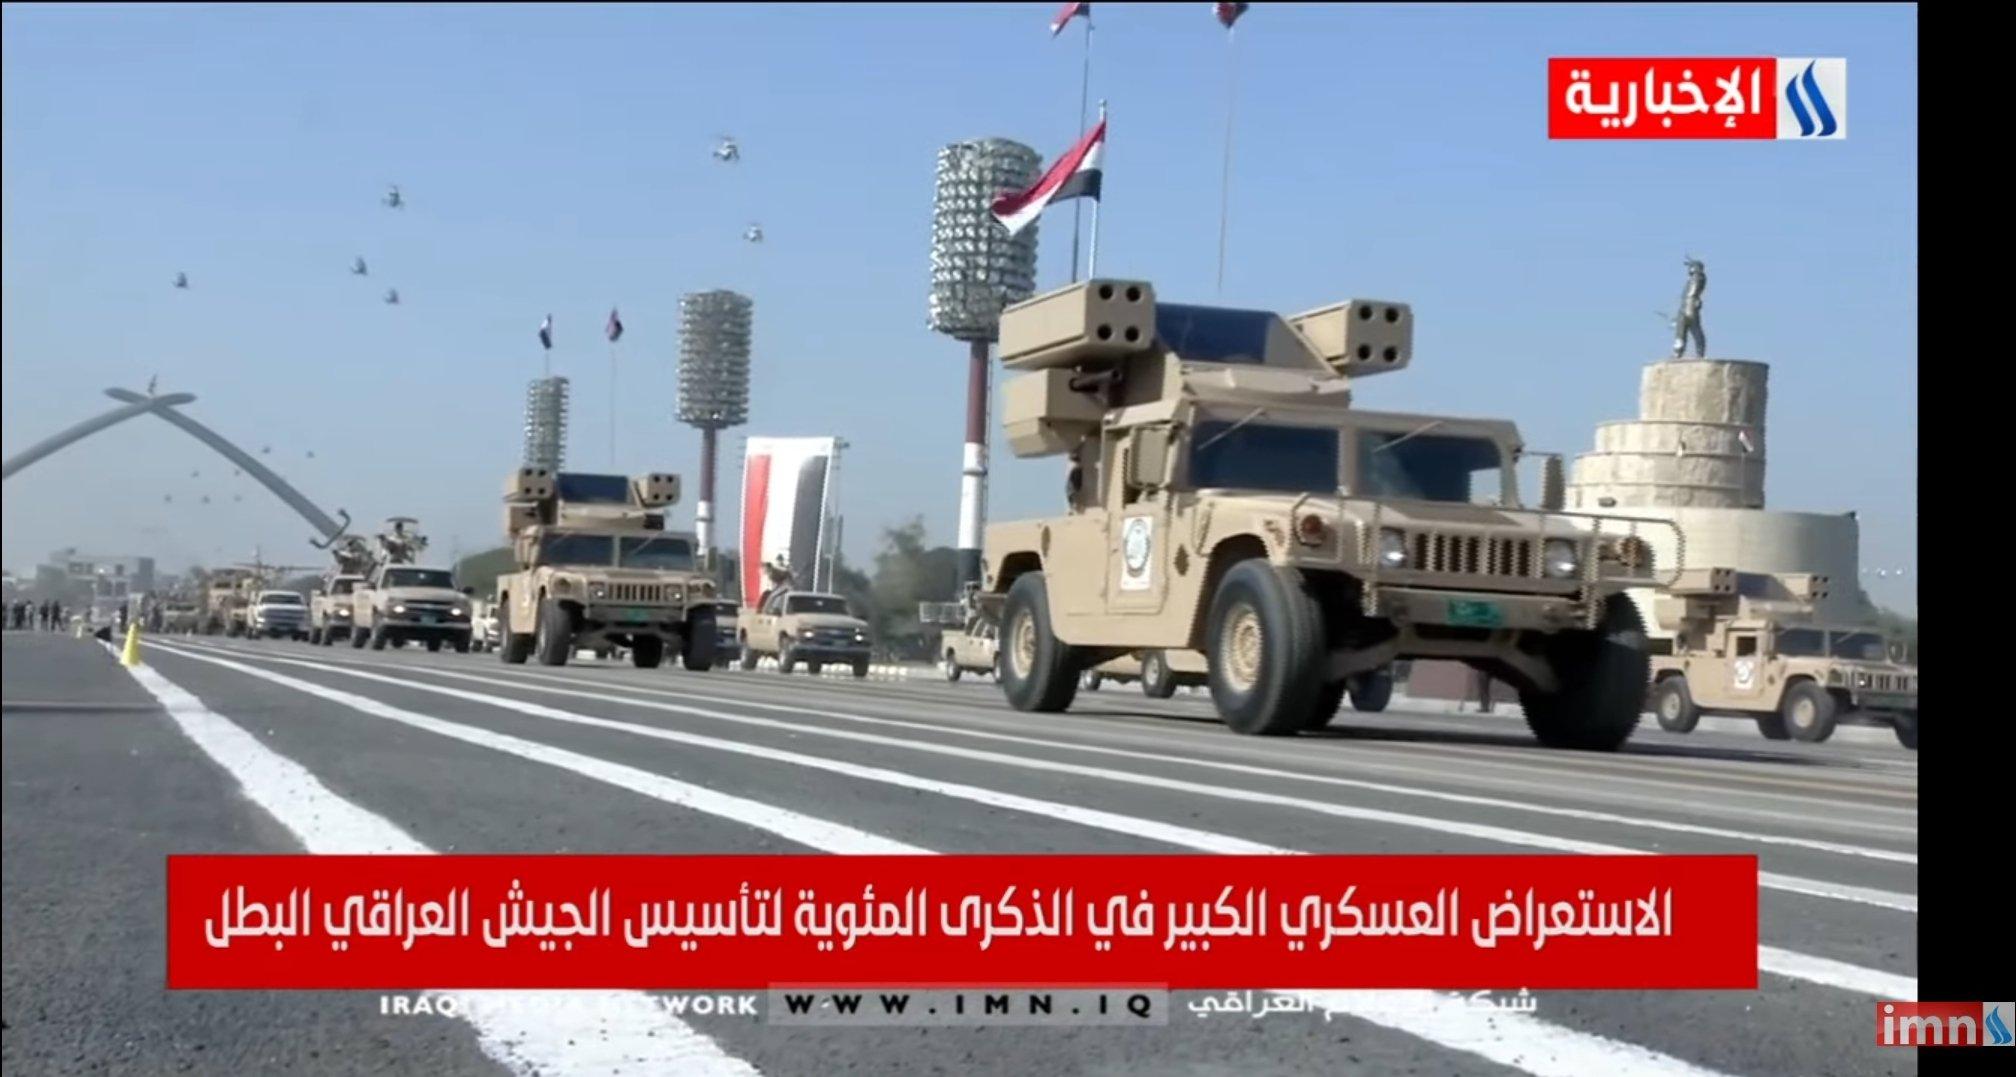 Armée Irakienne / Iraqi Armed Forces - Page 38 ErHx1jDXEAEYzTE?format=jpg&name=large